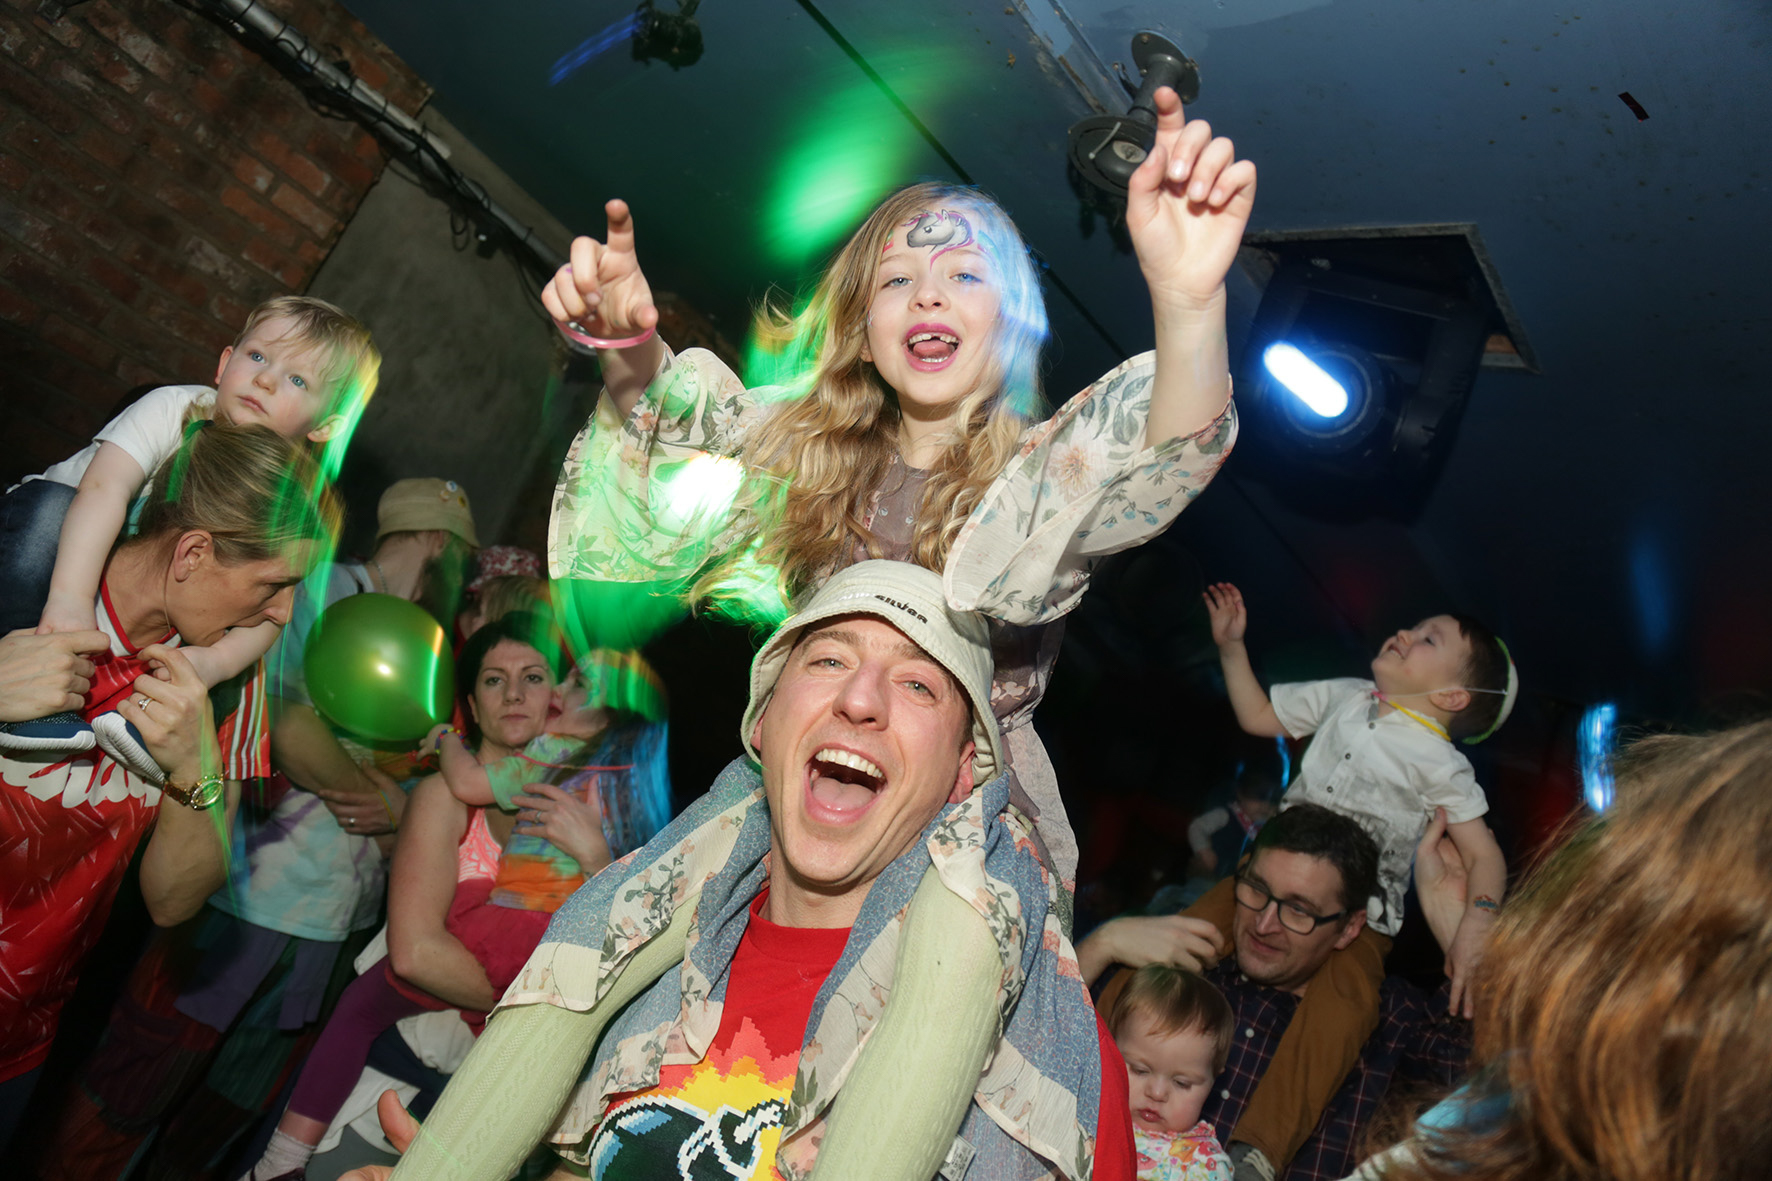 The festival has been held in cities across the UK